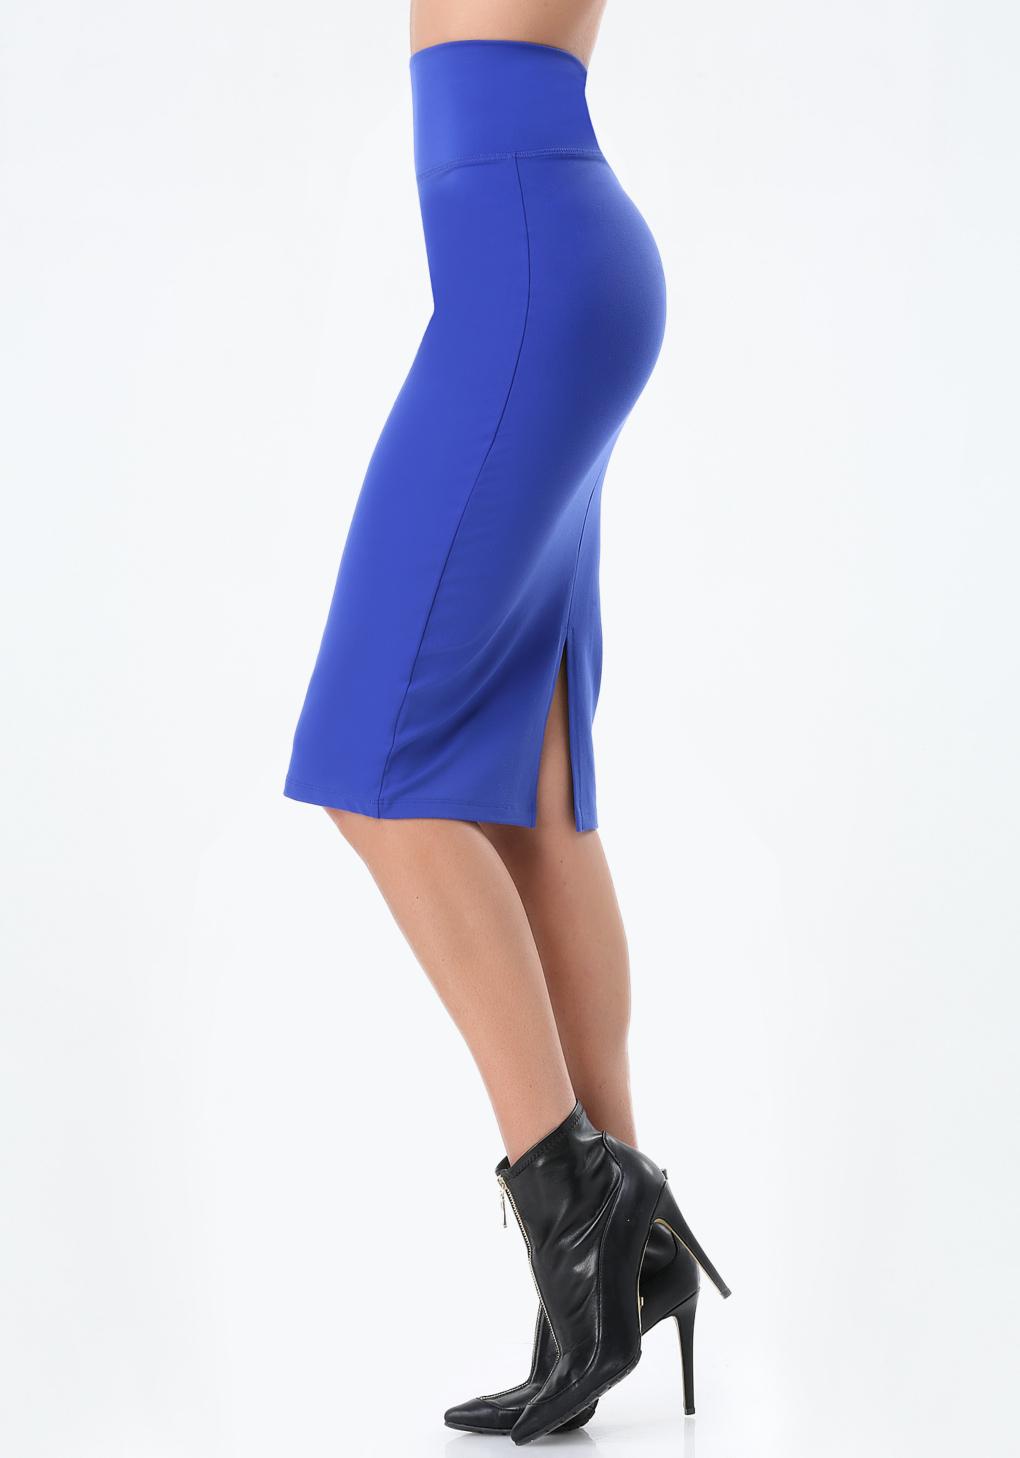 bebe petite knit midi skirt in blue surf the web lyst. Black Bedroom Furniture Sets. Home Design Ideas